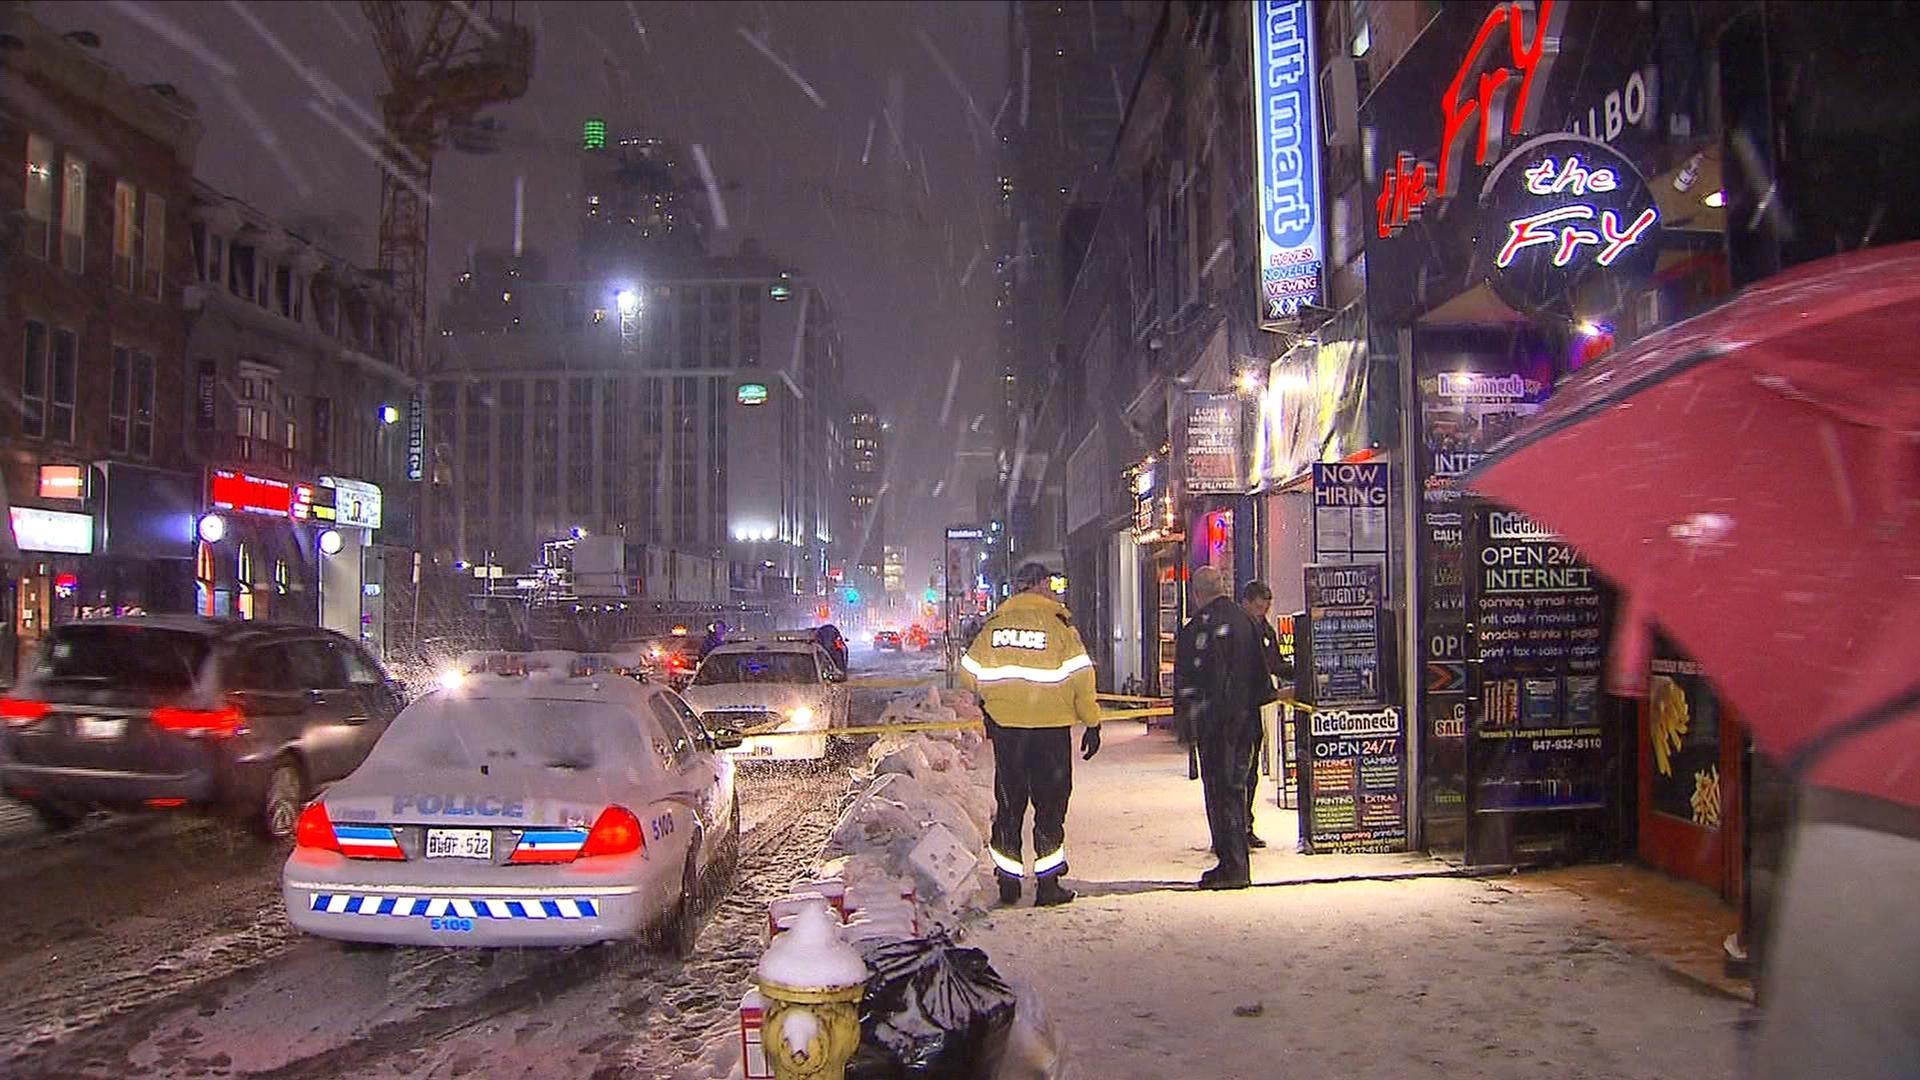 2 Men Arrested In Fatal Yonge Street Stabbing Citynews Toronto